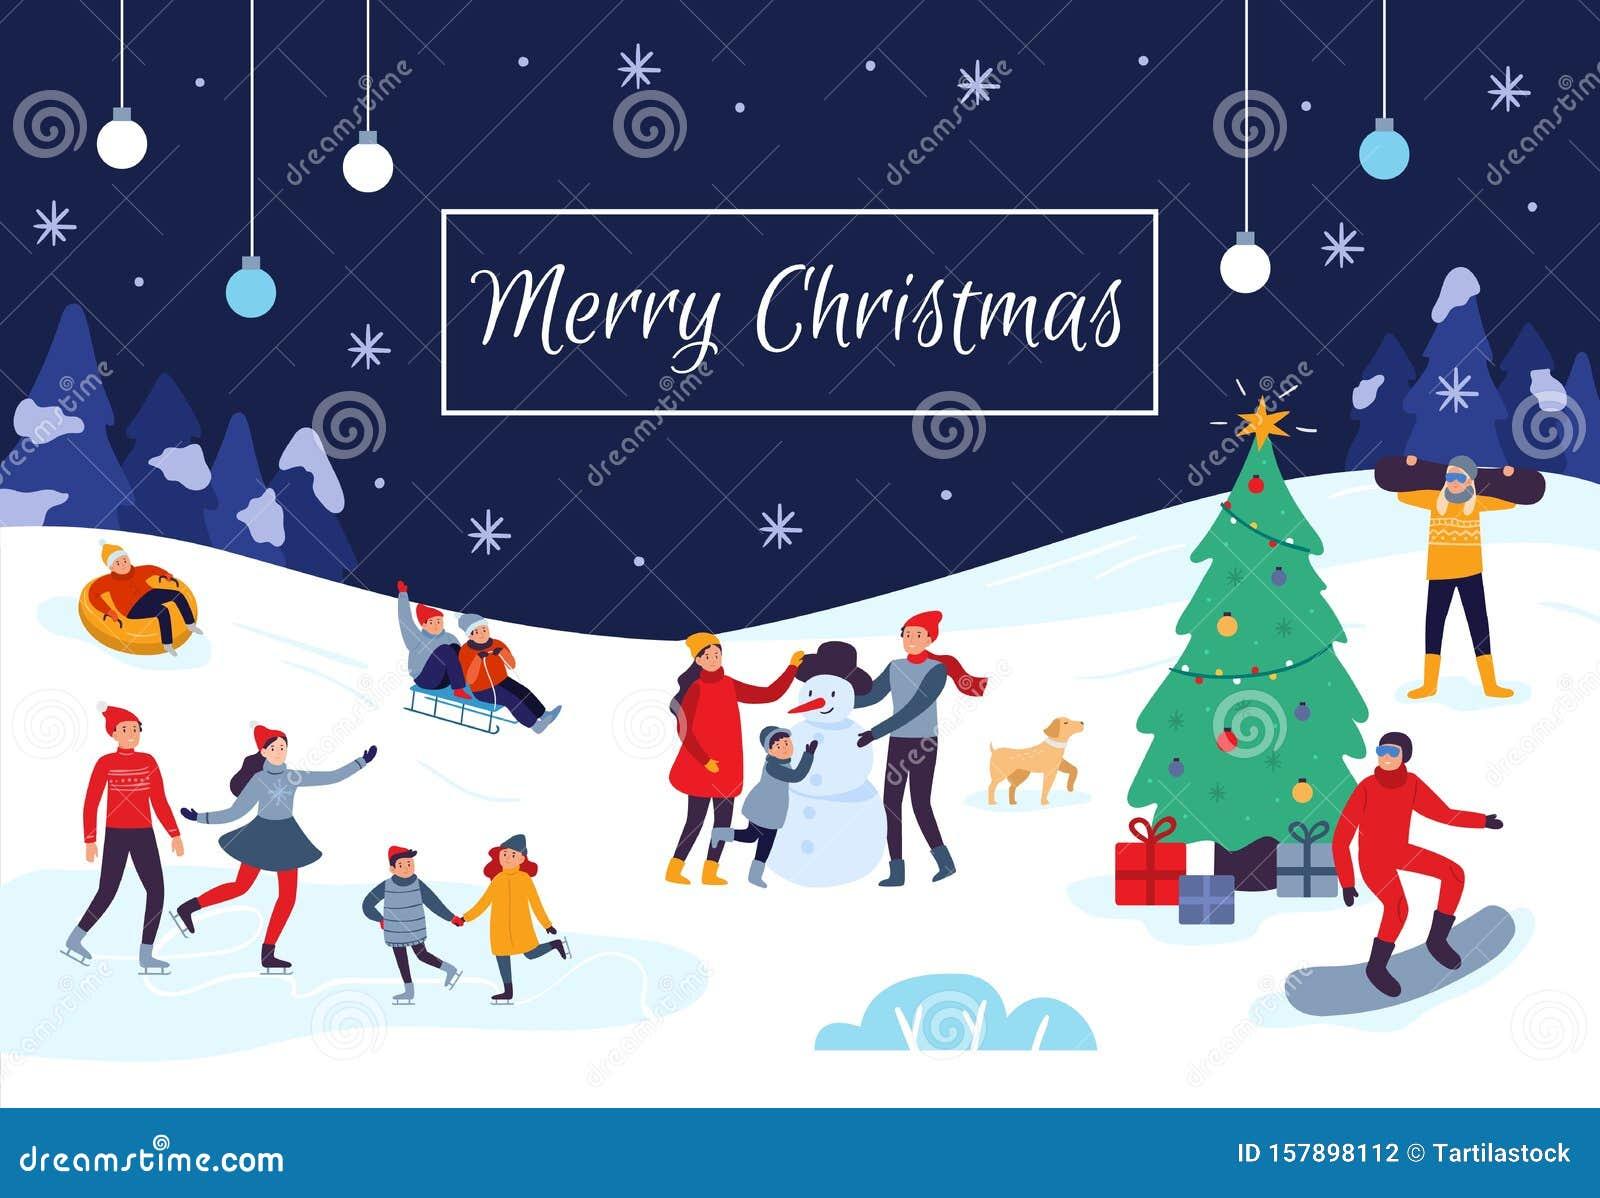 Christmas 2020 Activities For Kids Winter People Merry Christmas Card. Snow Activities, Happy Kids